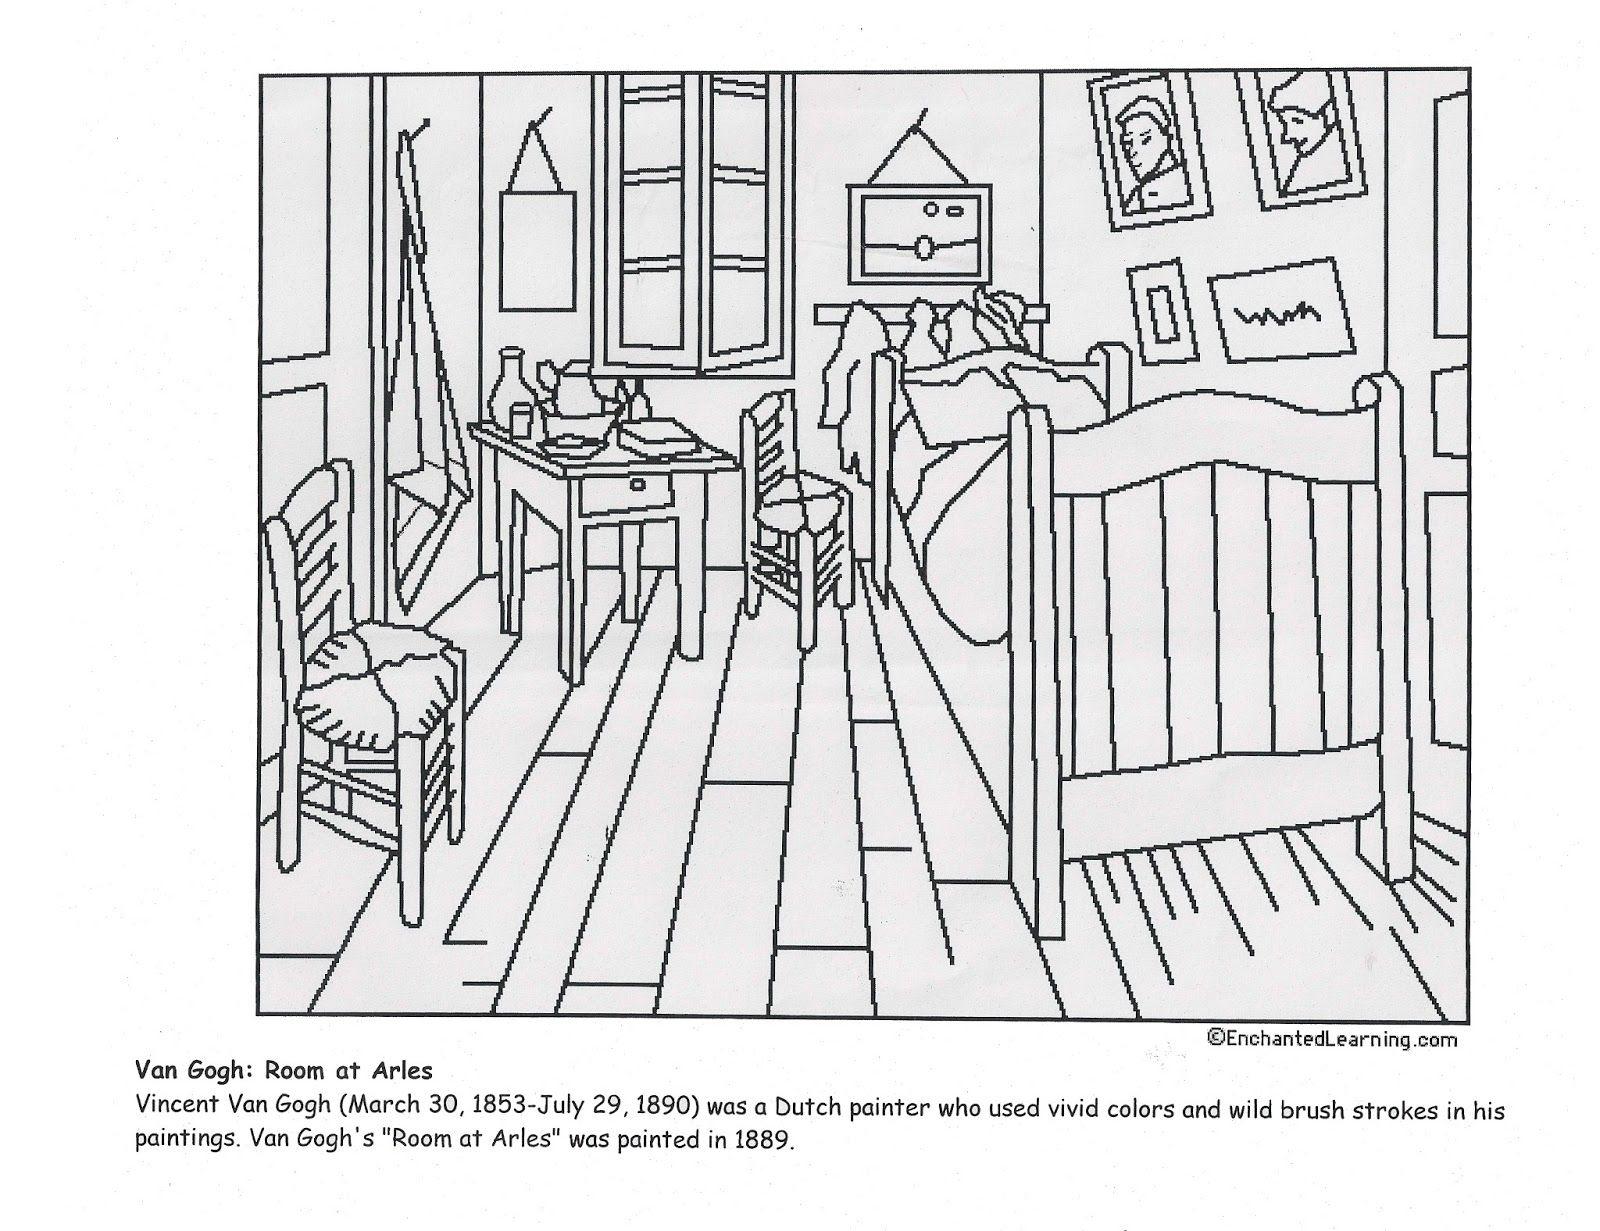 Vincent Van Gogh S Bedroom At Arles Coloring Page